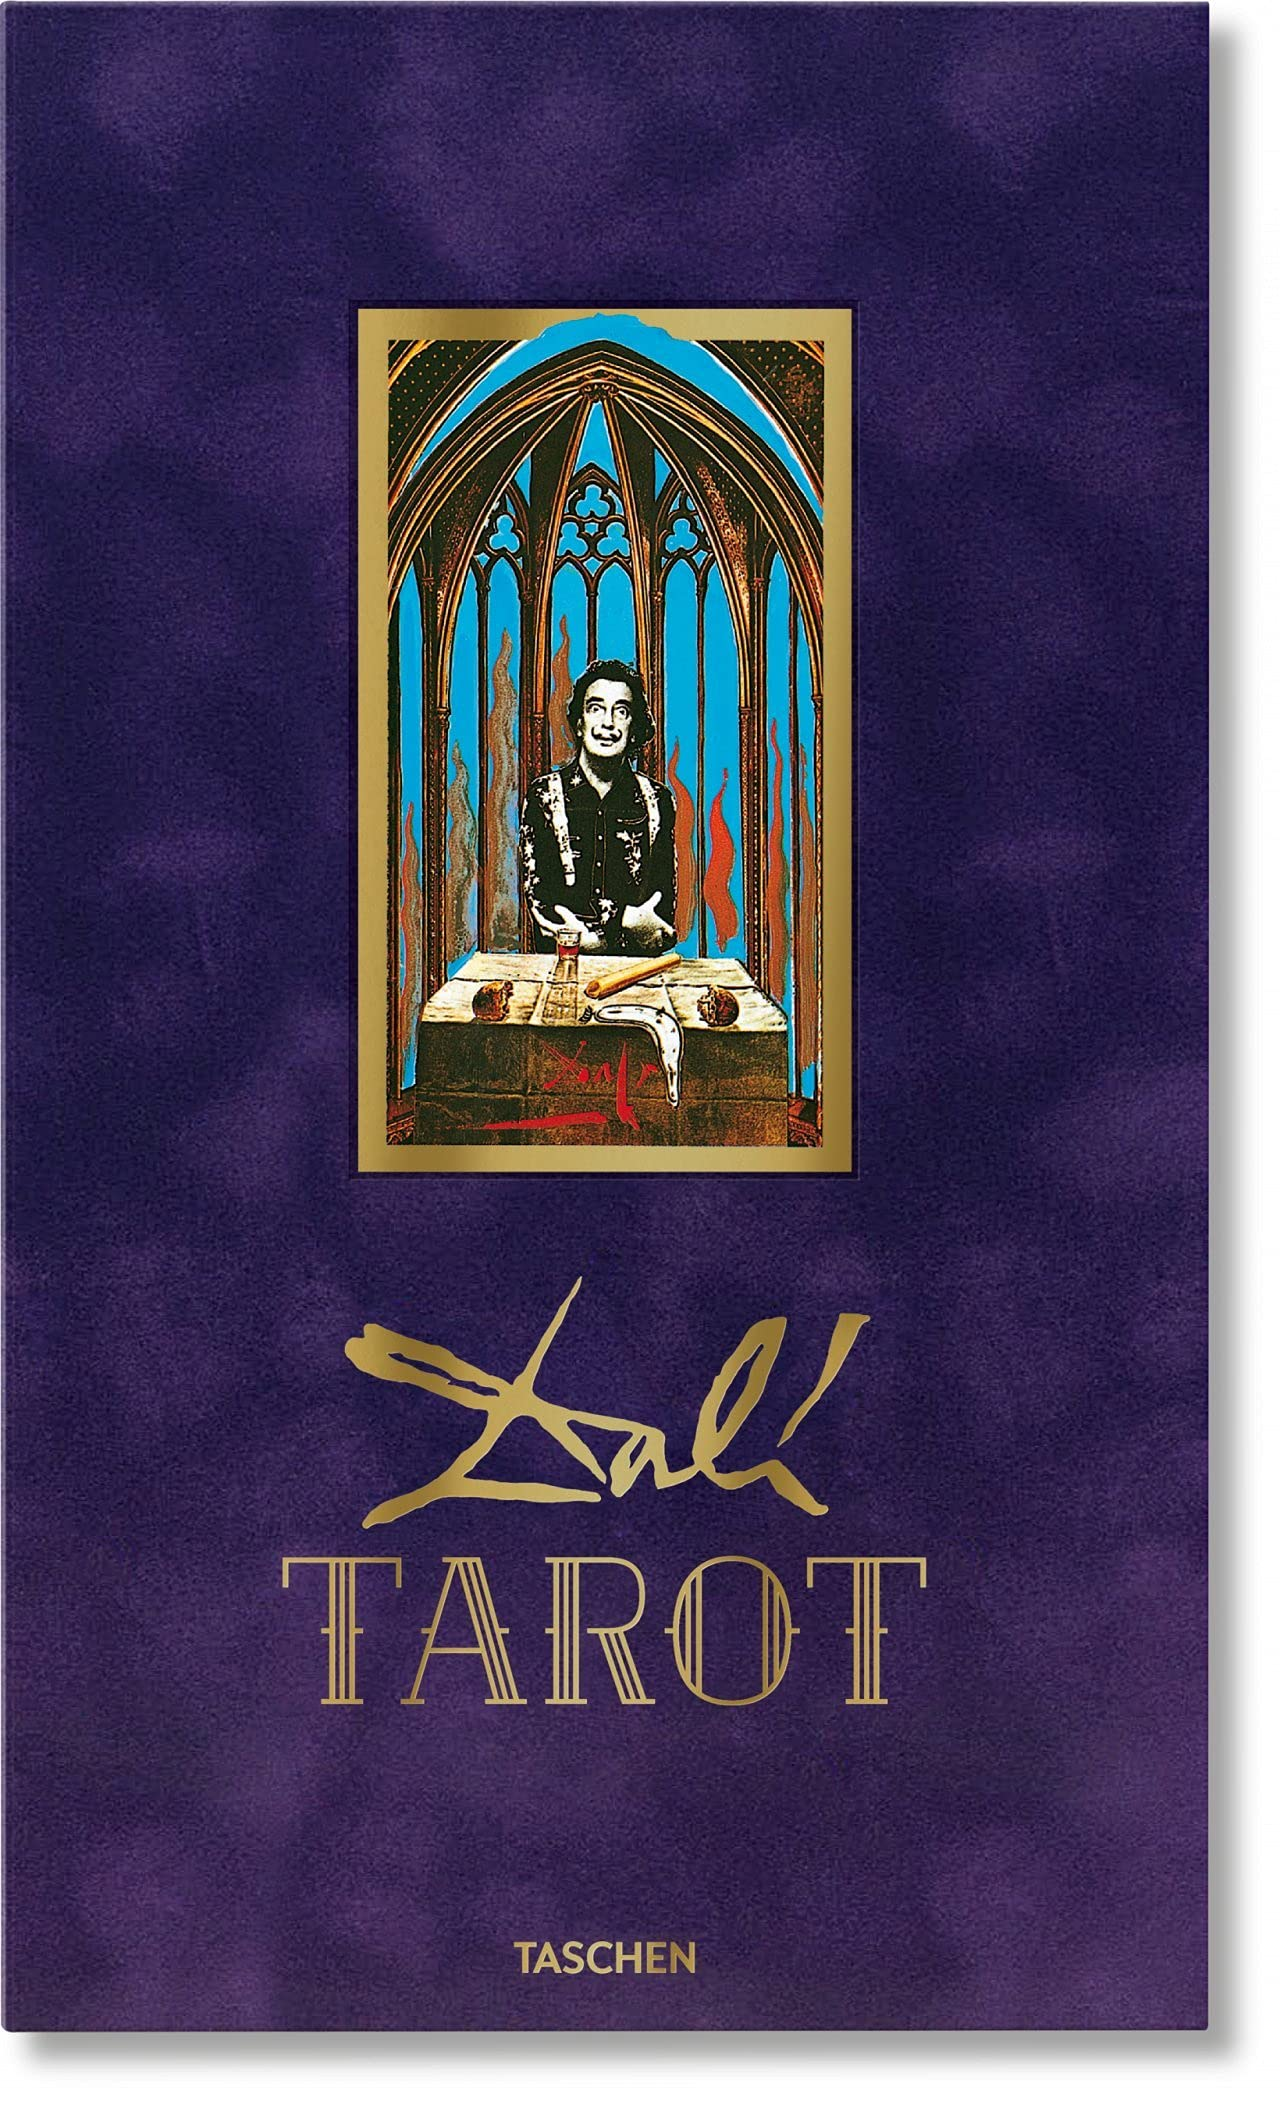 Dalí. Tarot (Multilingual Edition): Fiebig, Johannes: 9783836576123:  Amazon.com: Books